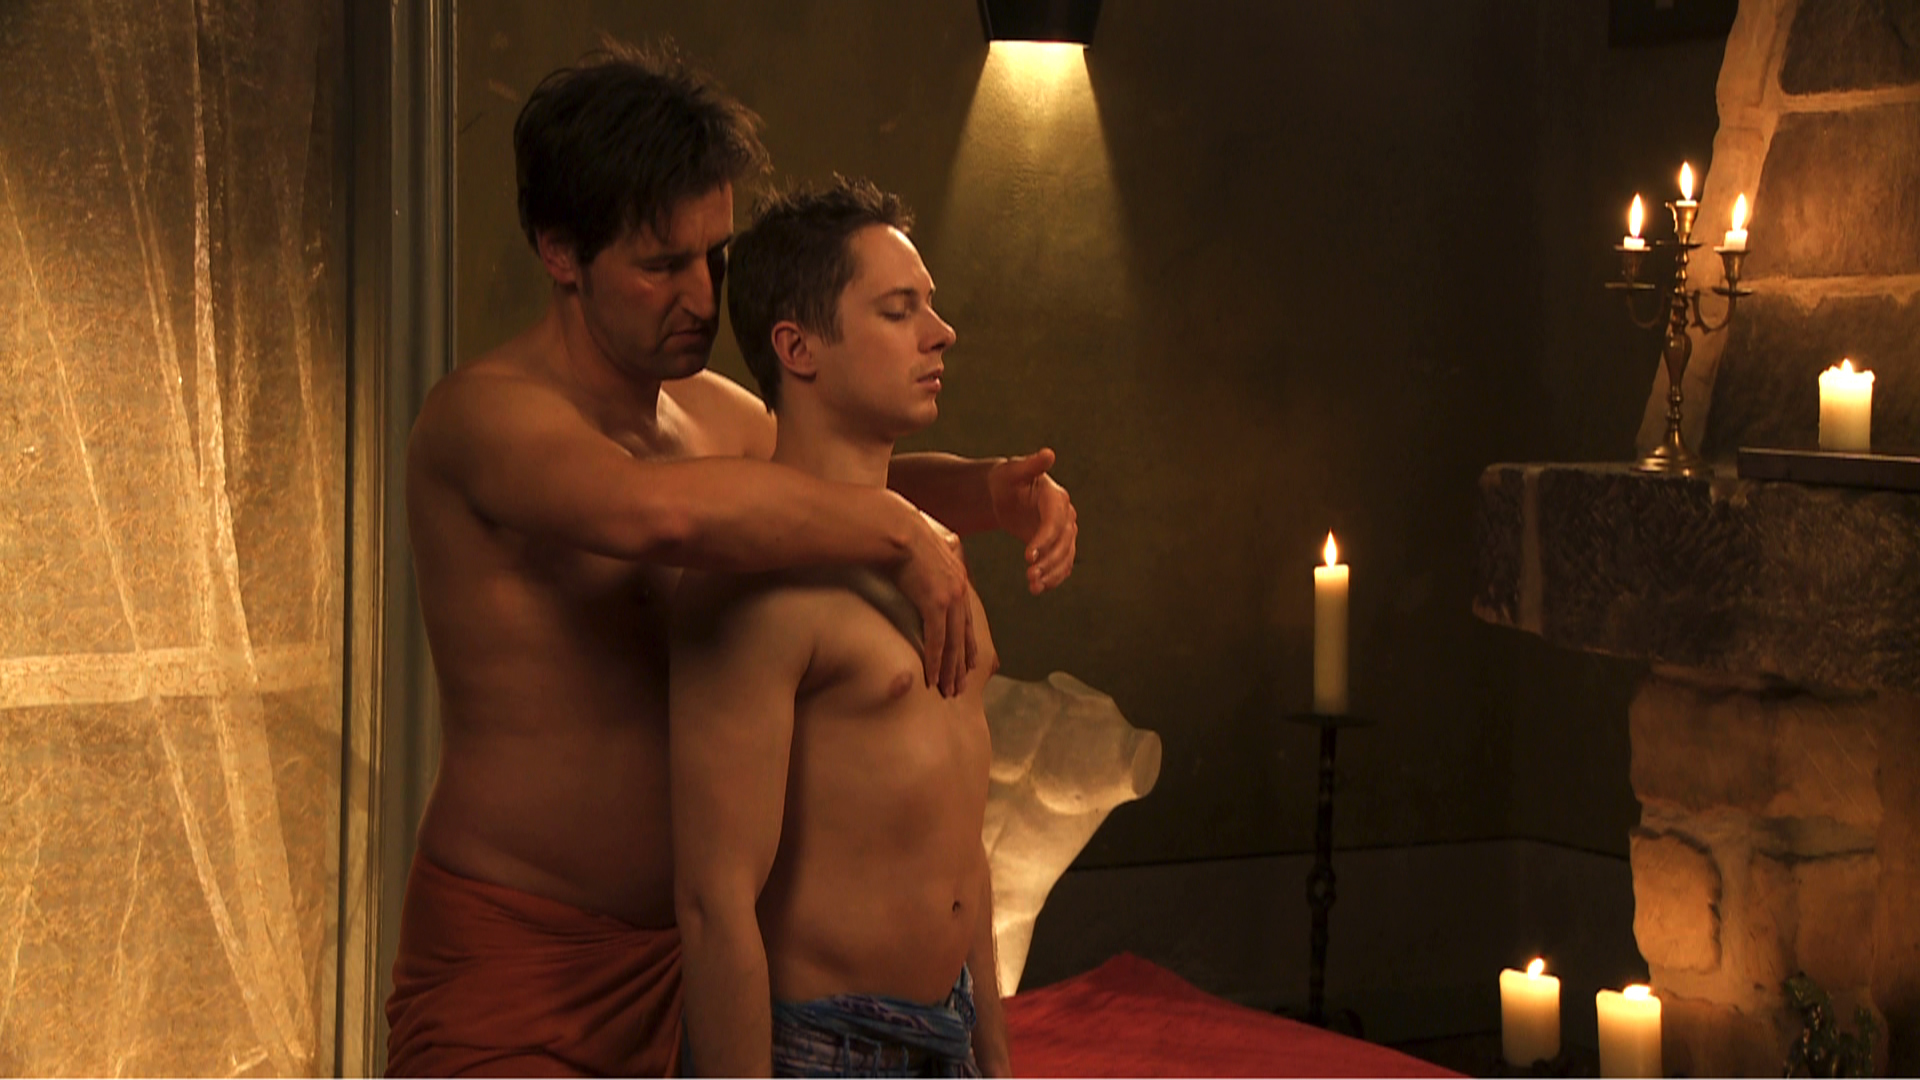 men tantra erotikfilme kostenlos schauen